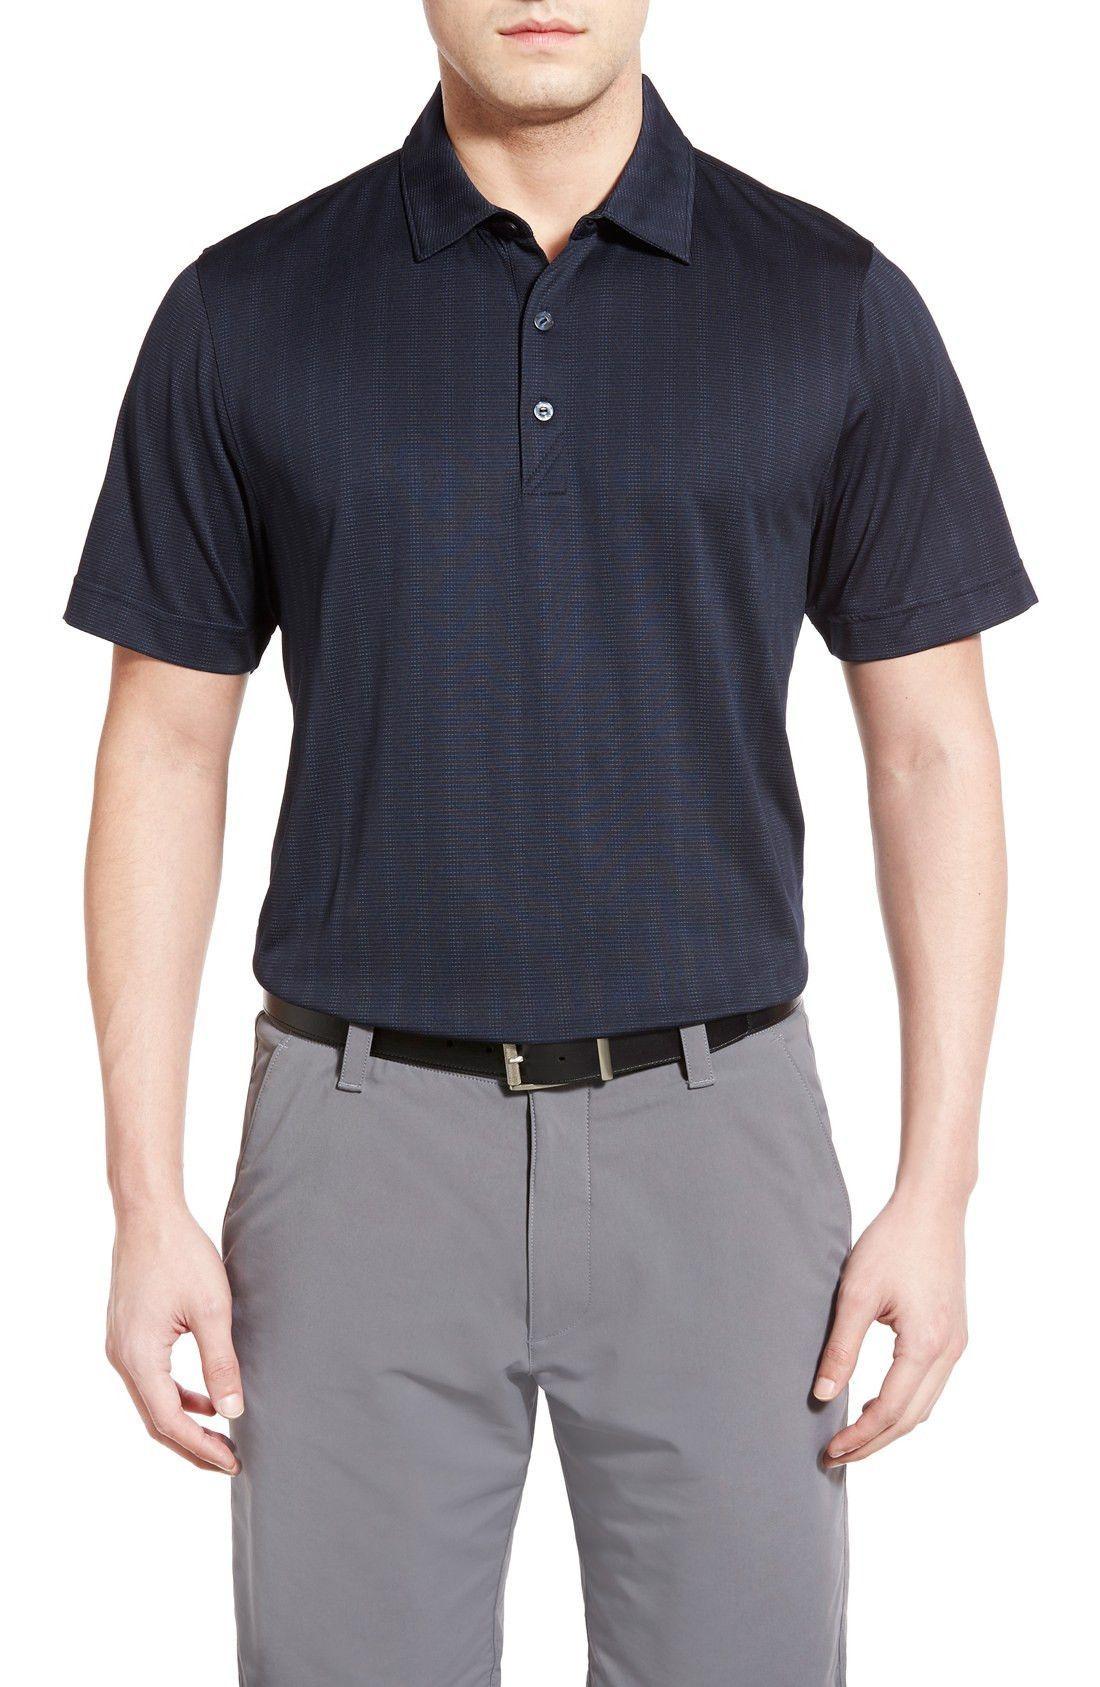 'Hamden Jacquard Stripe' DryTec Moisture Wicking Golf Polo #PlaySportsShop #fitnessfashion #sportclothes #playsportshop #freeshipping #thenewme